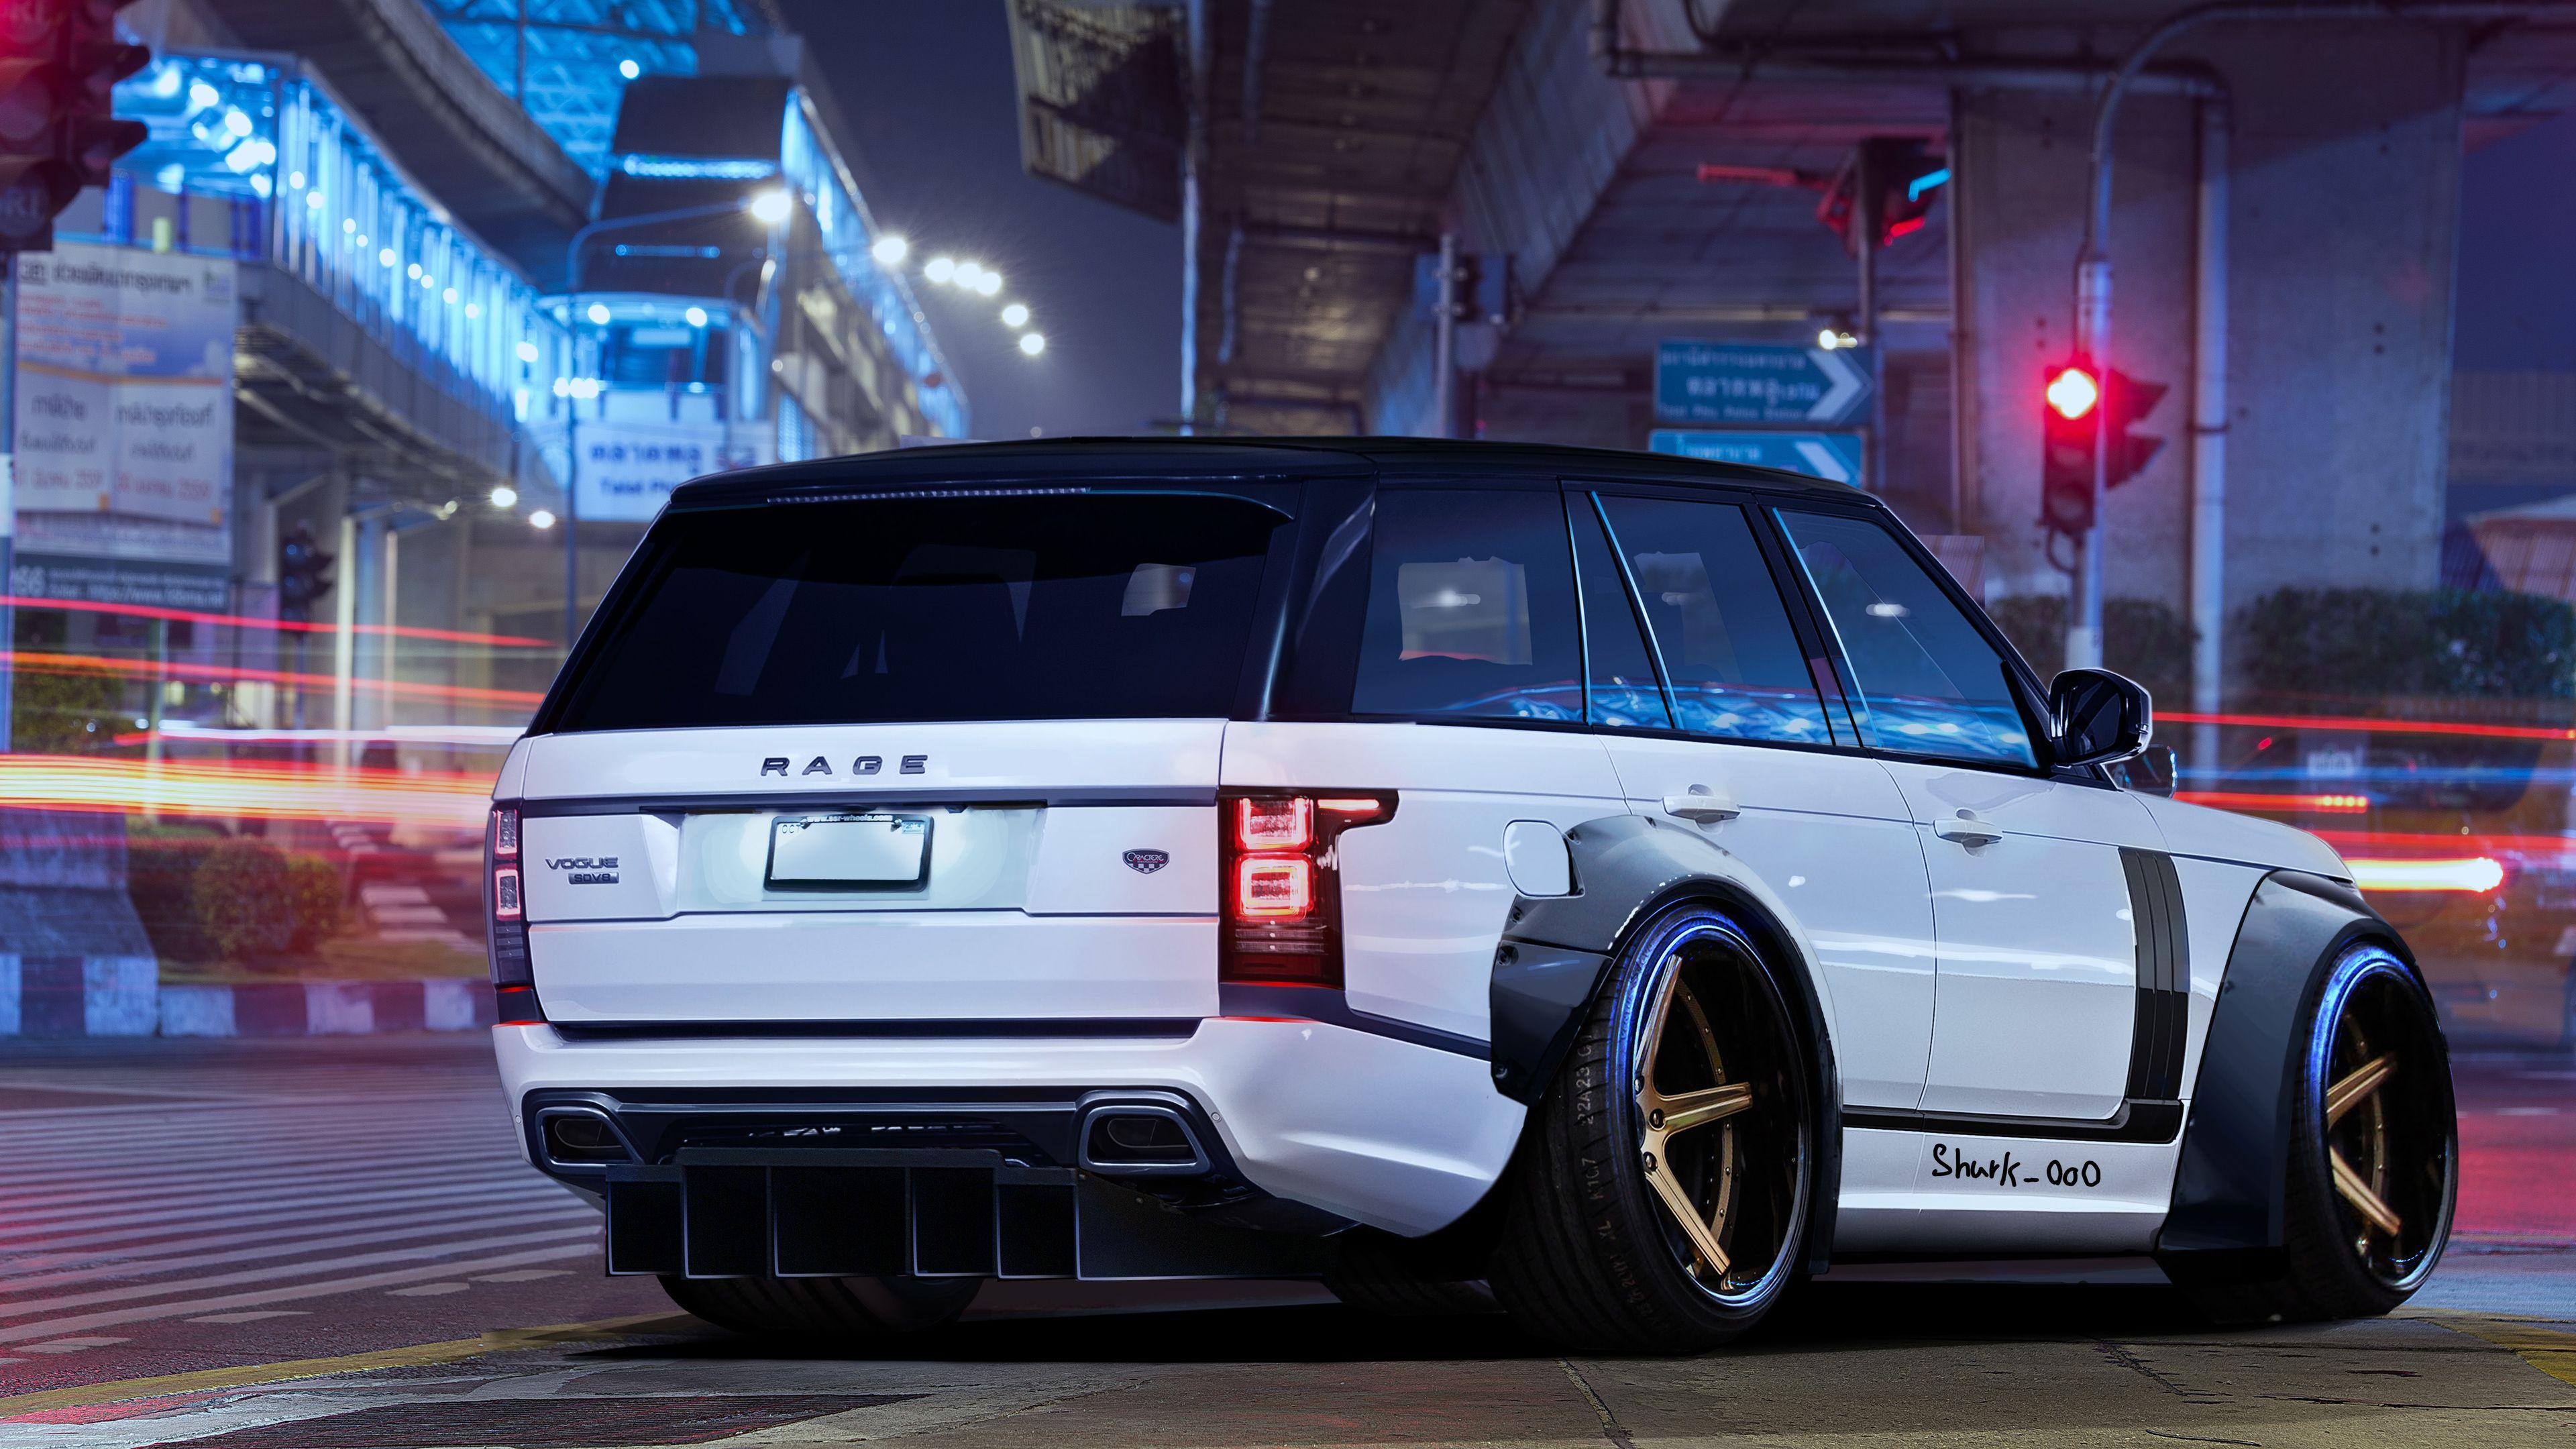 Range Rover Art White Wallpapers Range Rover Wallpapers Hd